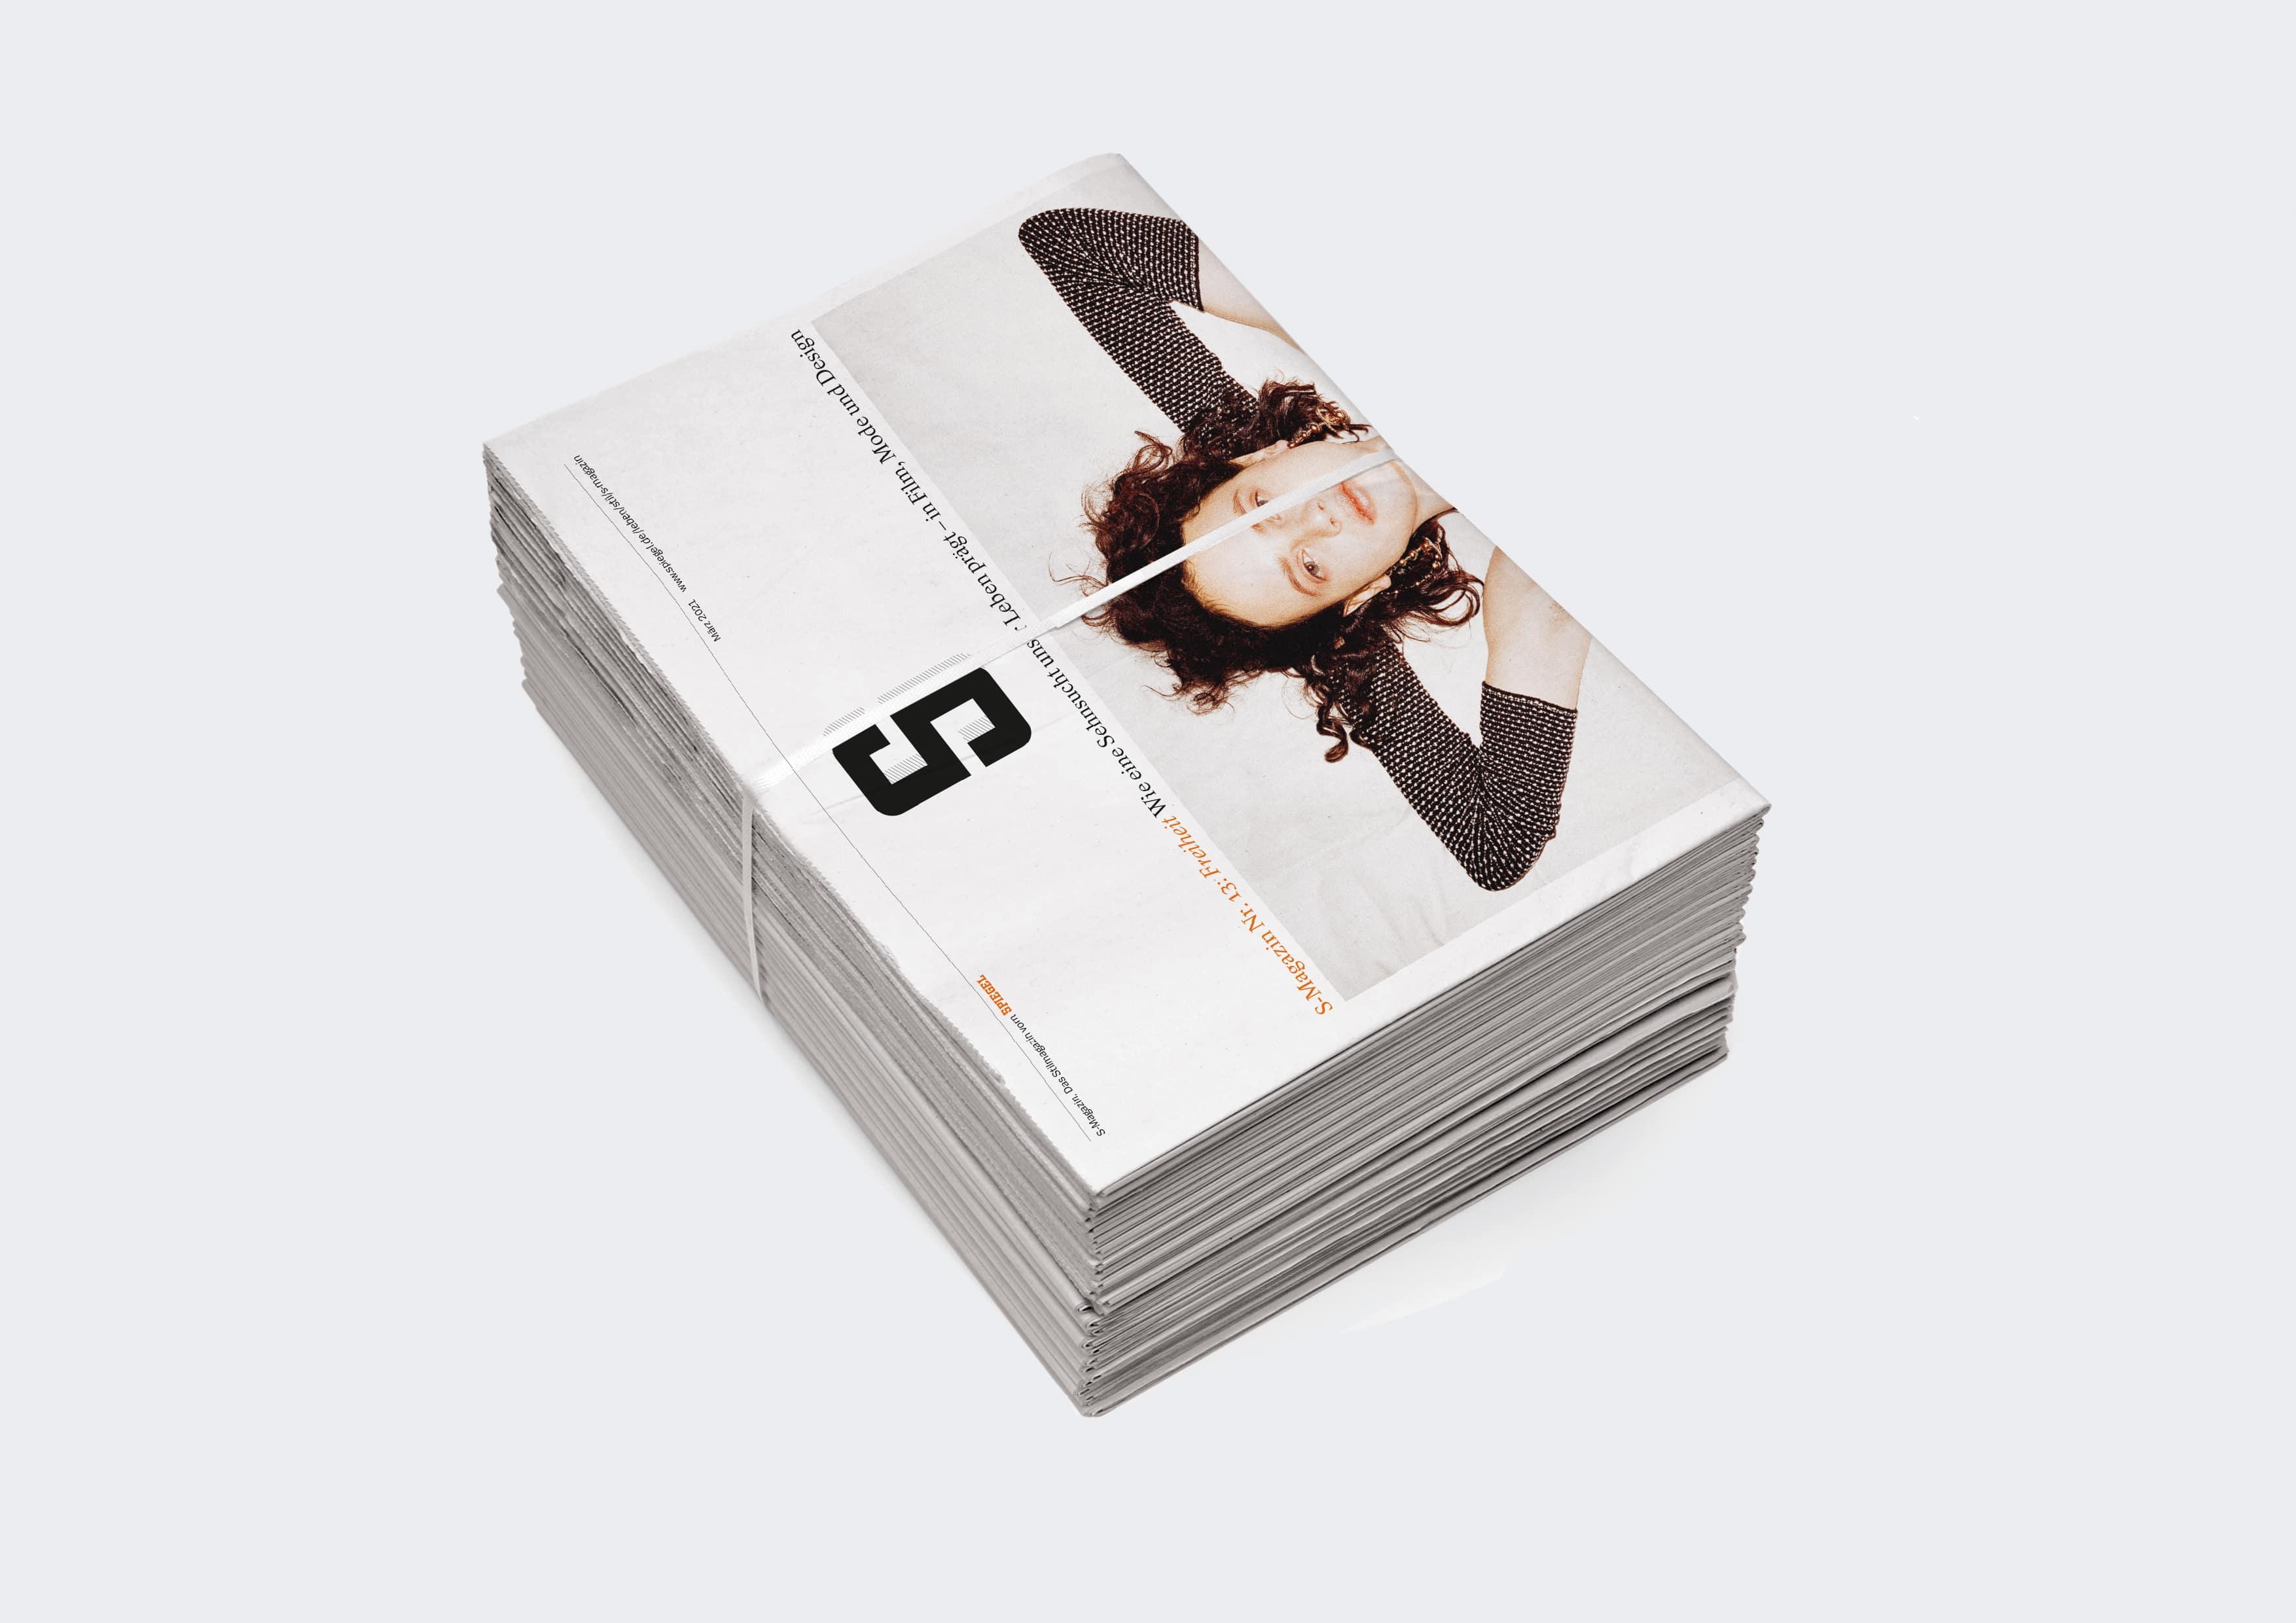 Bureau Johannes Erler – S-Magazin Nr. 13: Freiheit